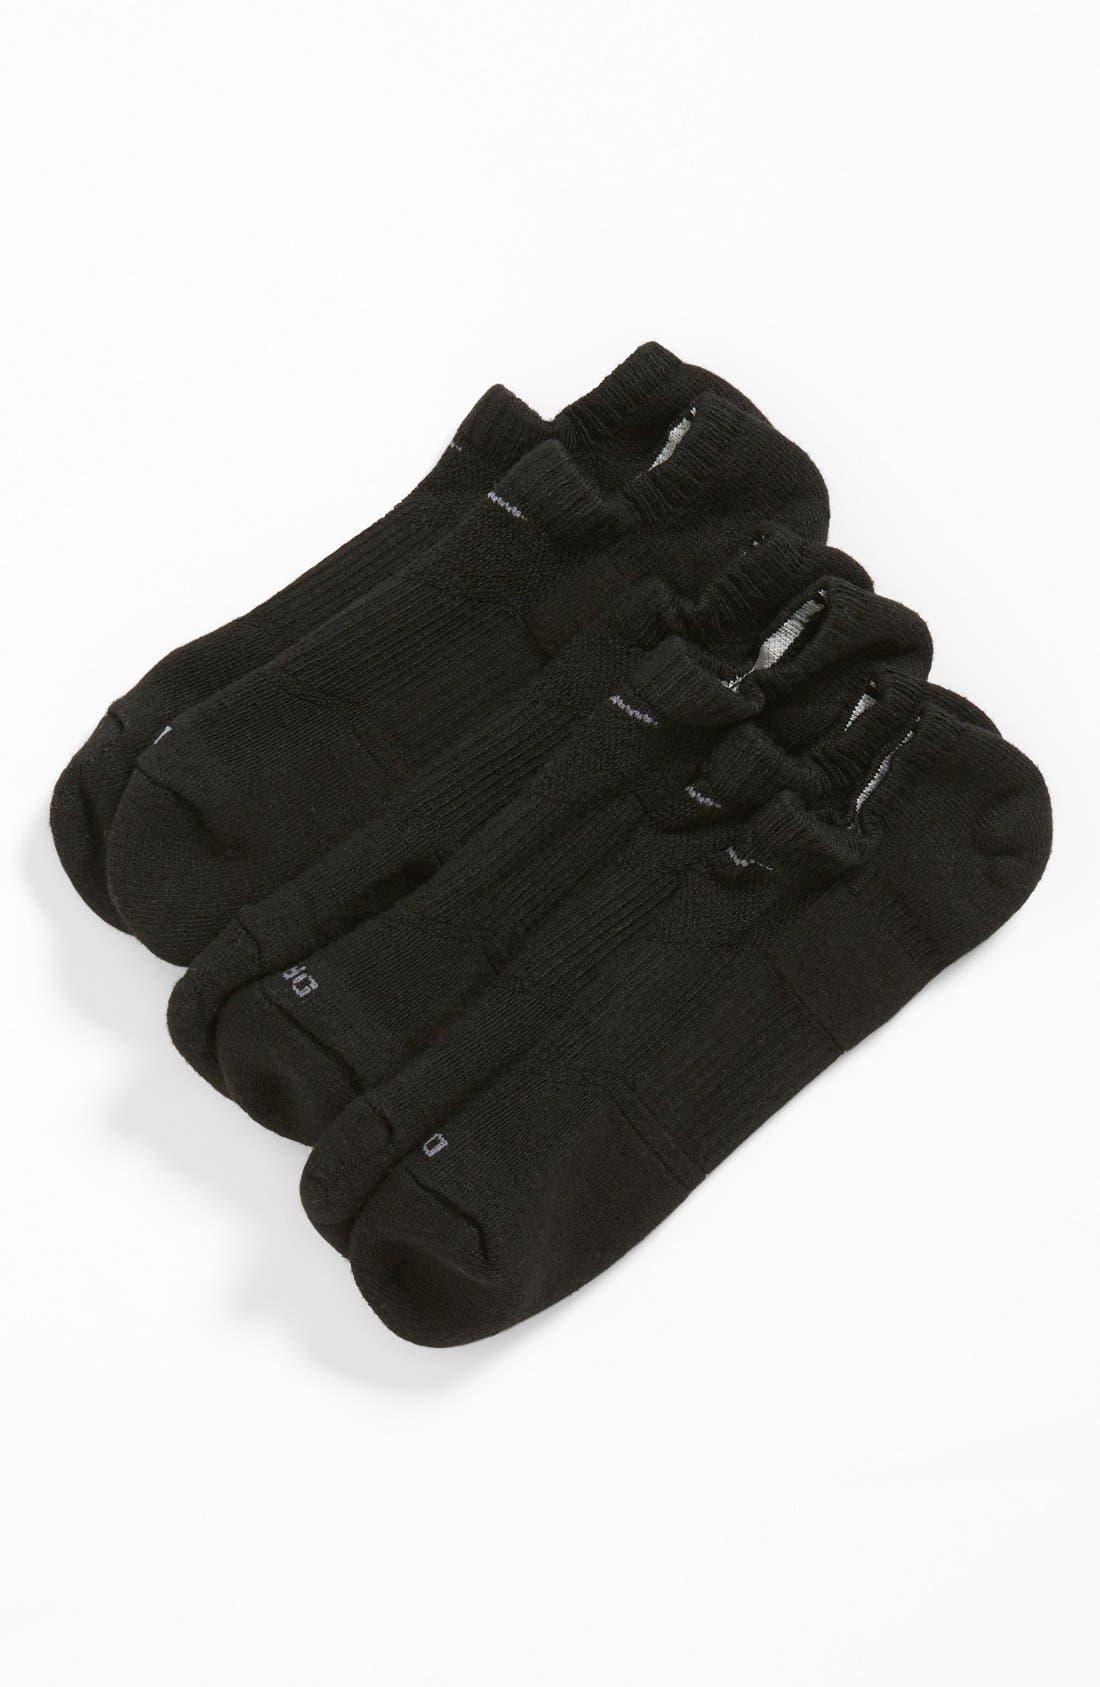 Main Image - Nike Dri-FIT 3-Pack Cushioned No-Show Socks